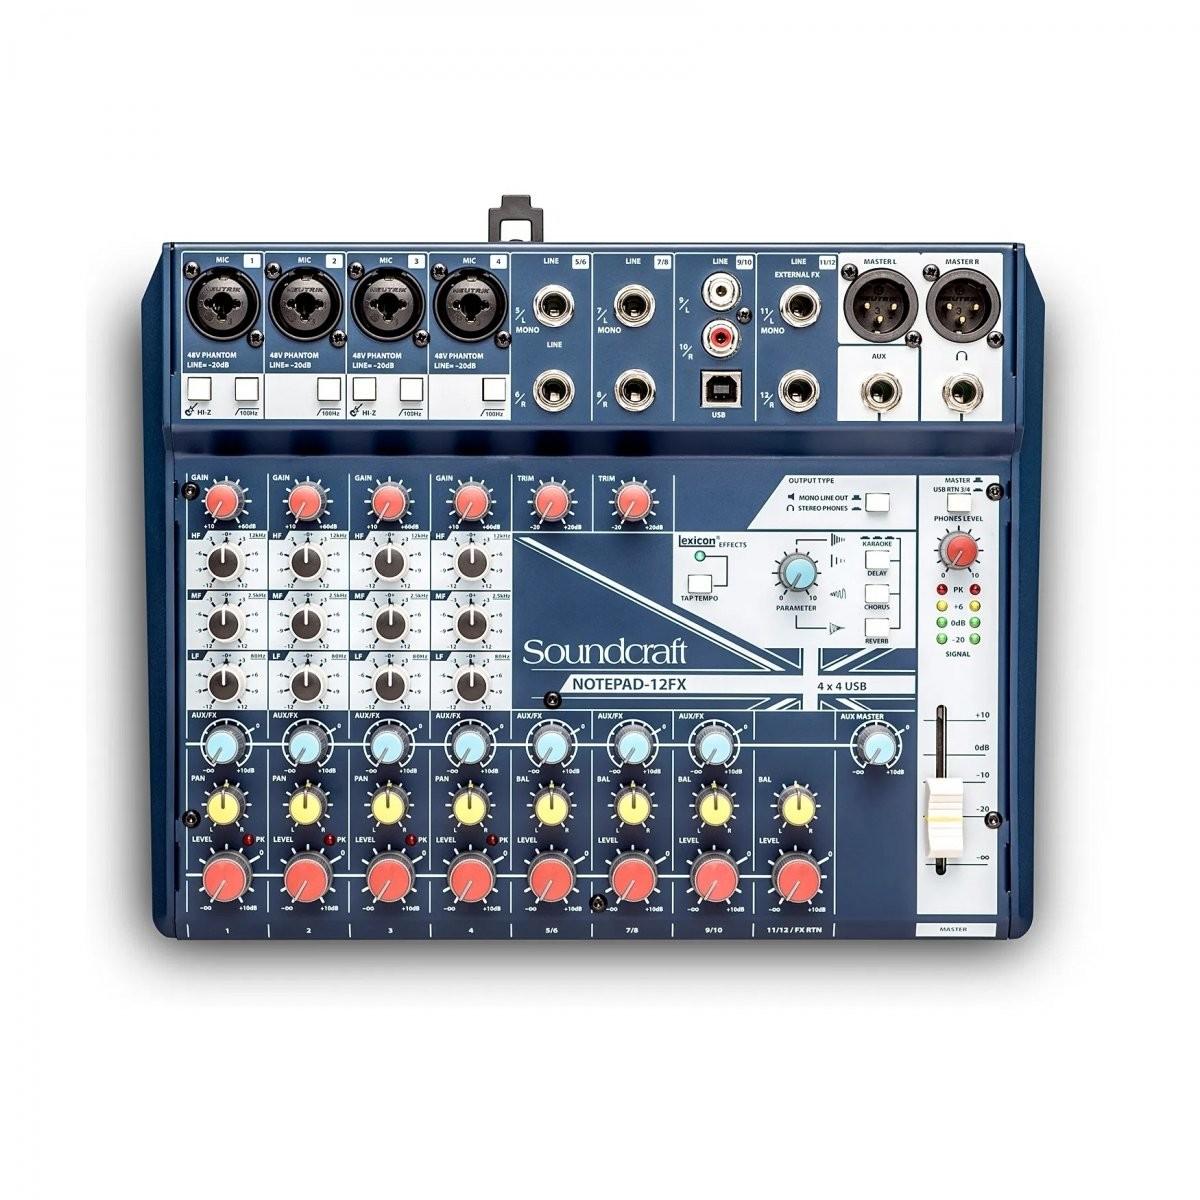 Soundcraft Notepad 12FX mikser audio